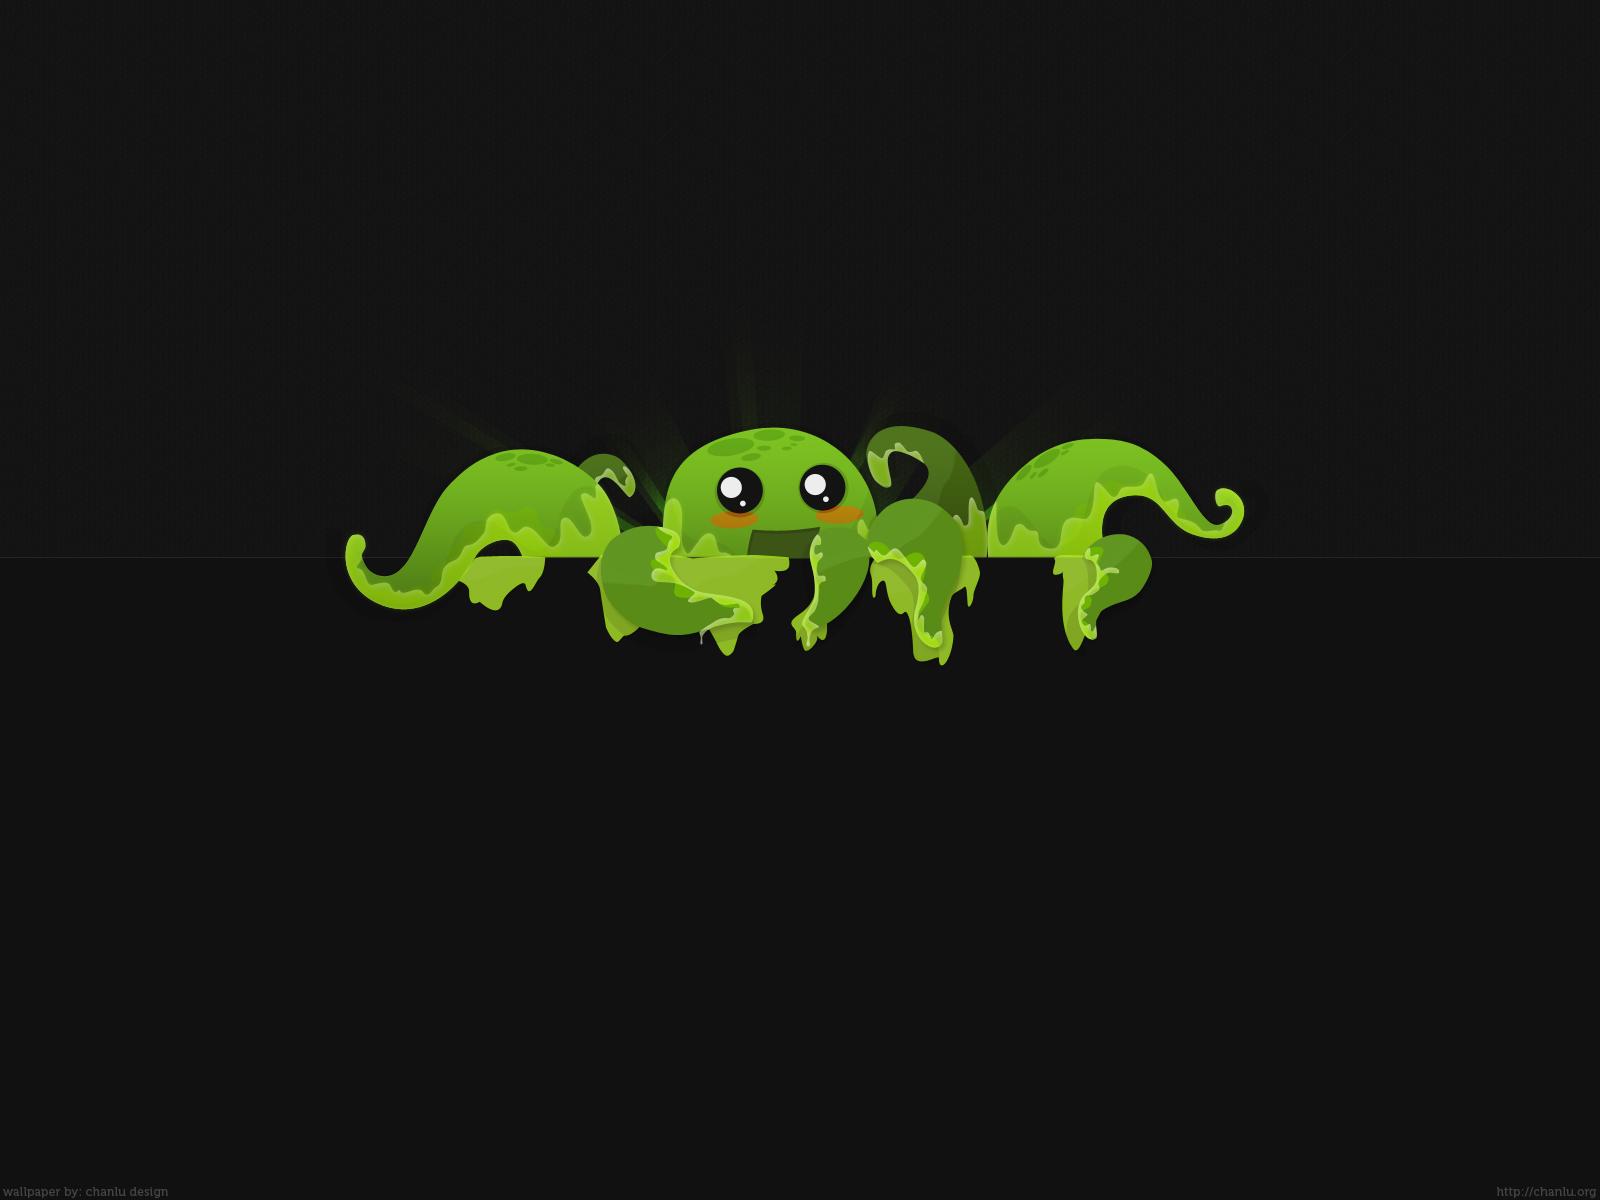 http://1.bp.blogspot.com/-VcAvO0Y95sQ/UJP6W2k14QI/AAAAAAAAG98/dtLoiBzjVxs/s1600/The+Shining+Green+Octopus.jpg